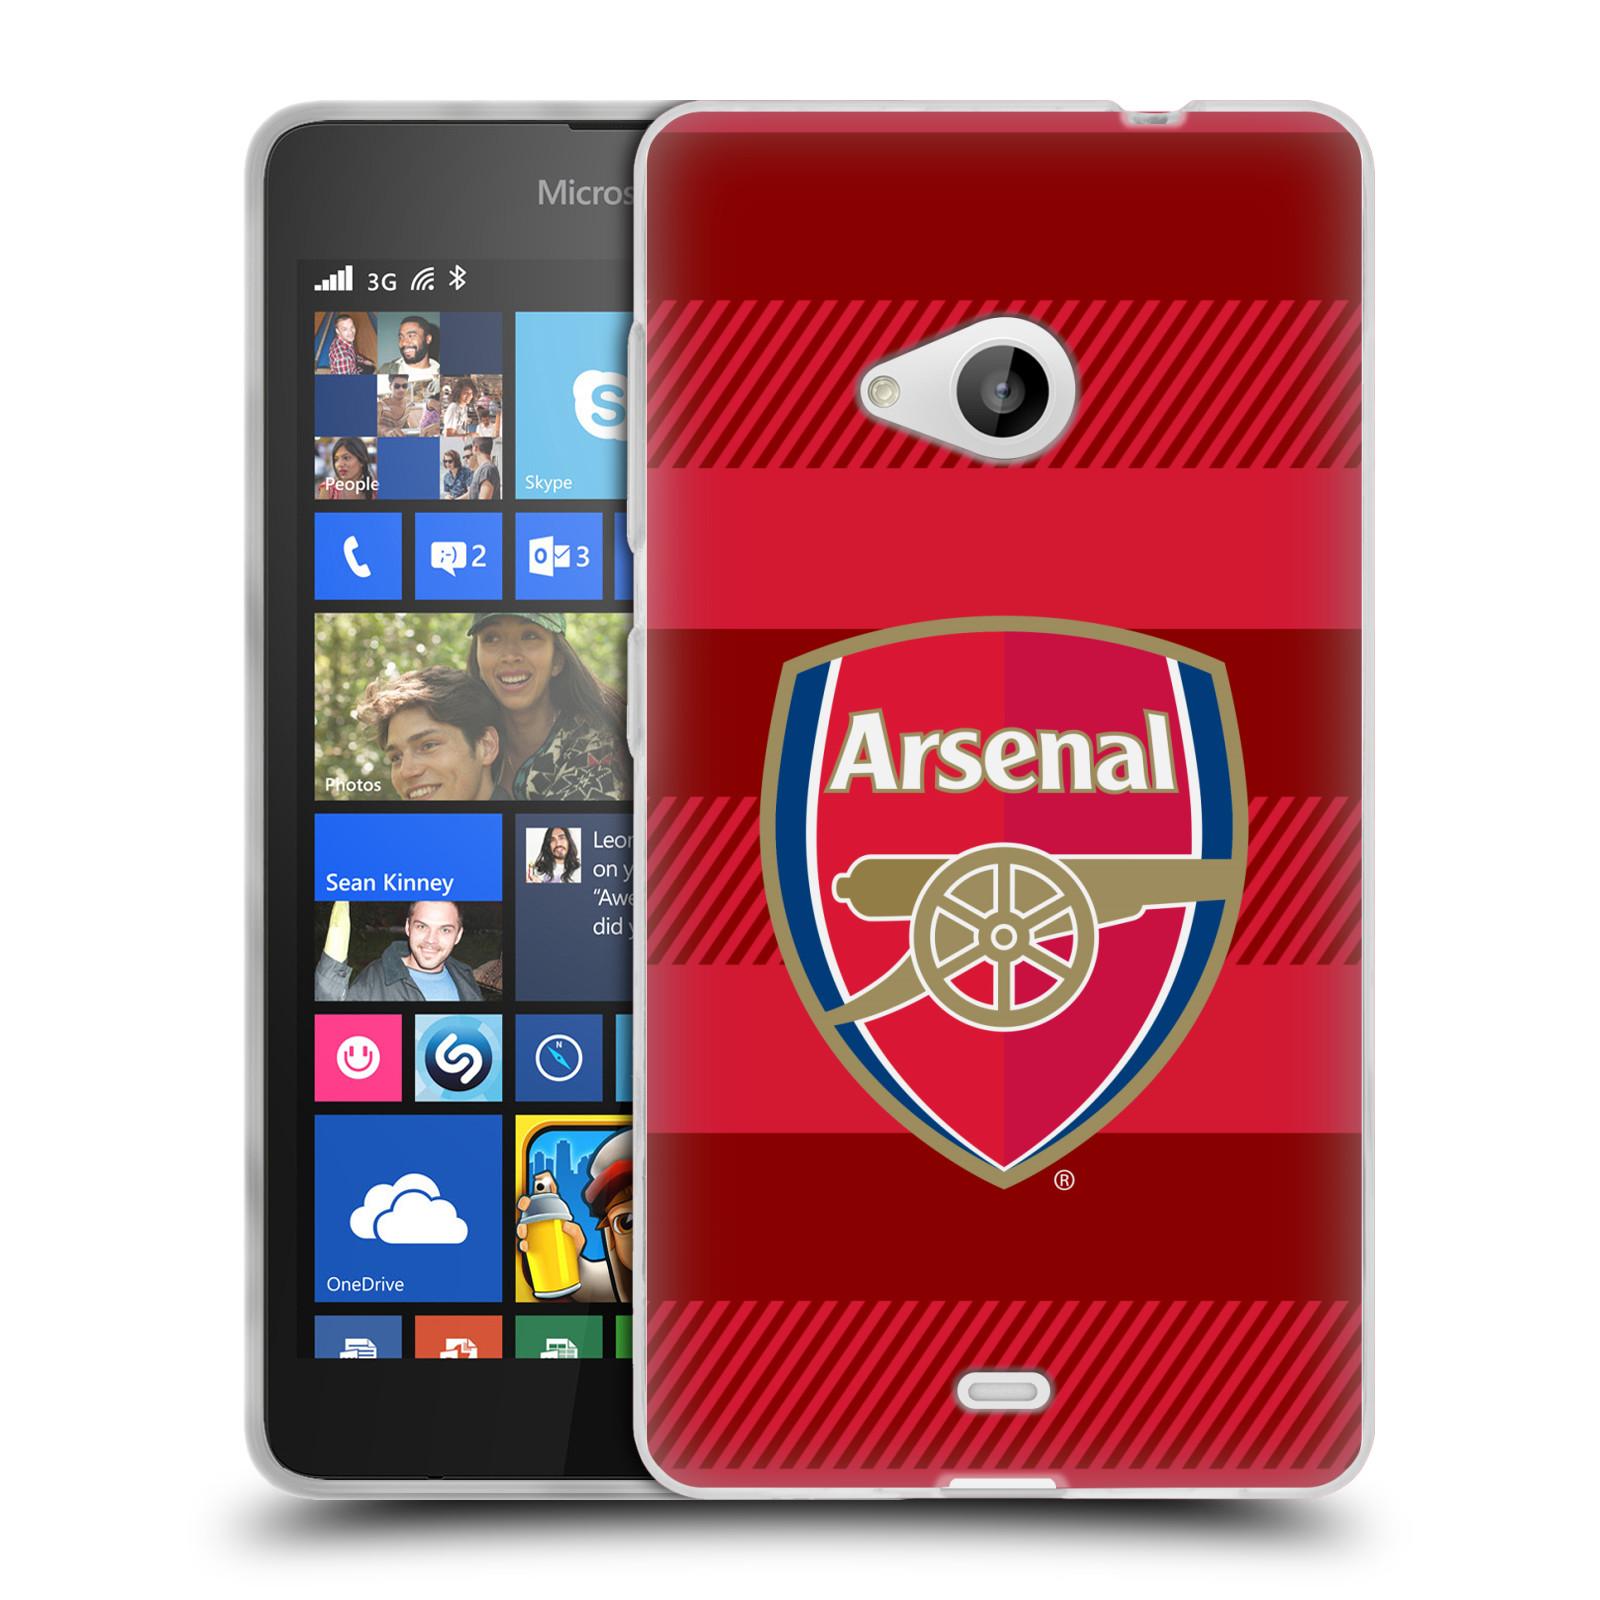 Silikonové pouzdro na mobil Microsoft Lumia 535 - Head Case - Arsenal FC - Logo s pruhy